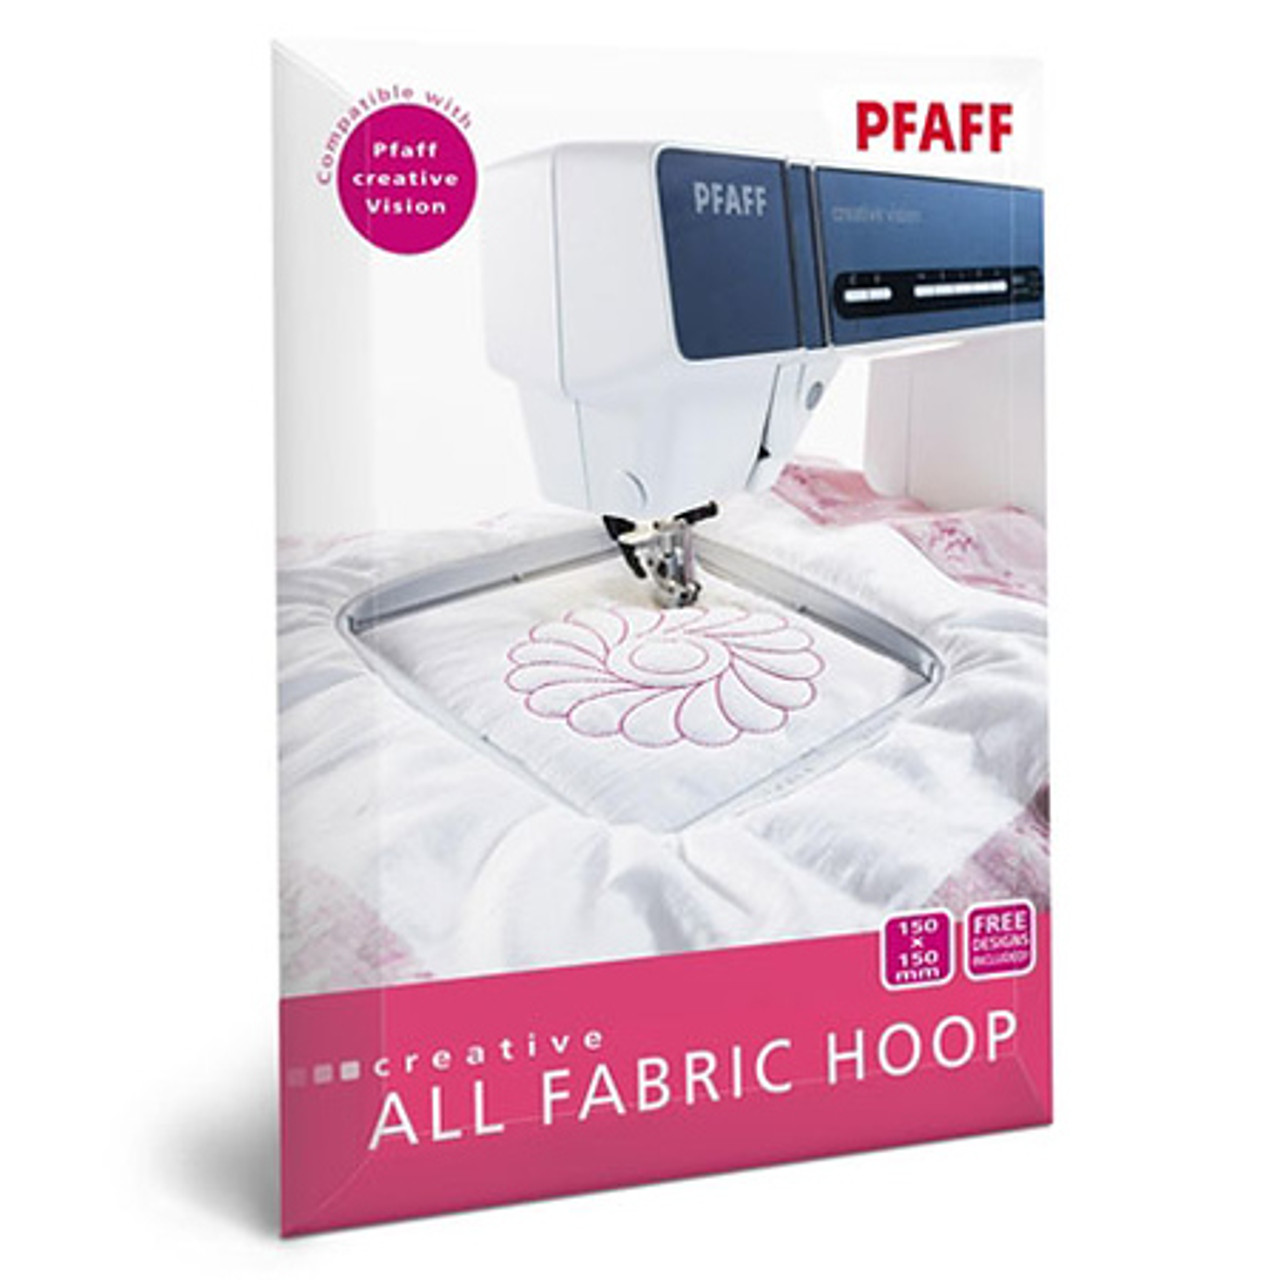 Creative All Fabric Hoop 2